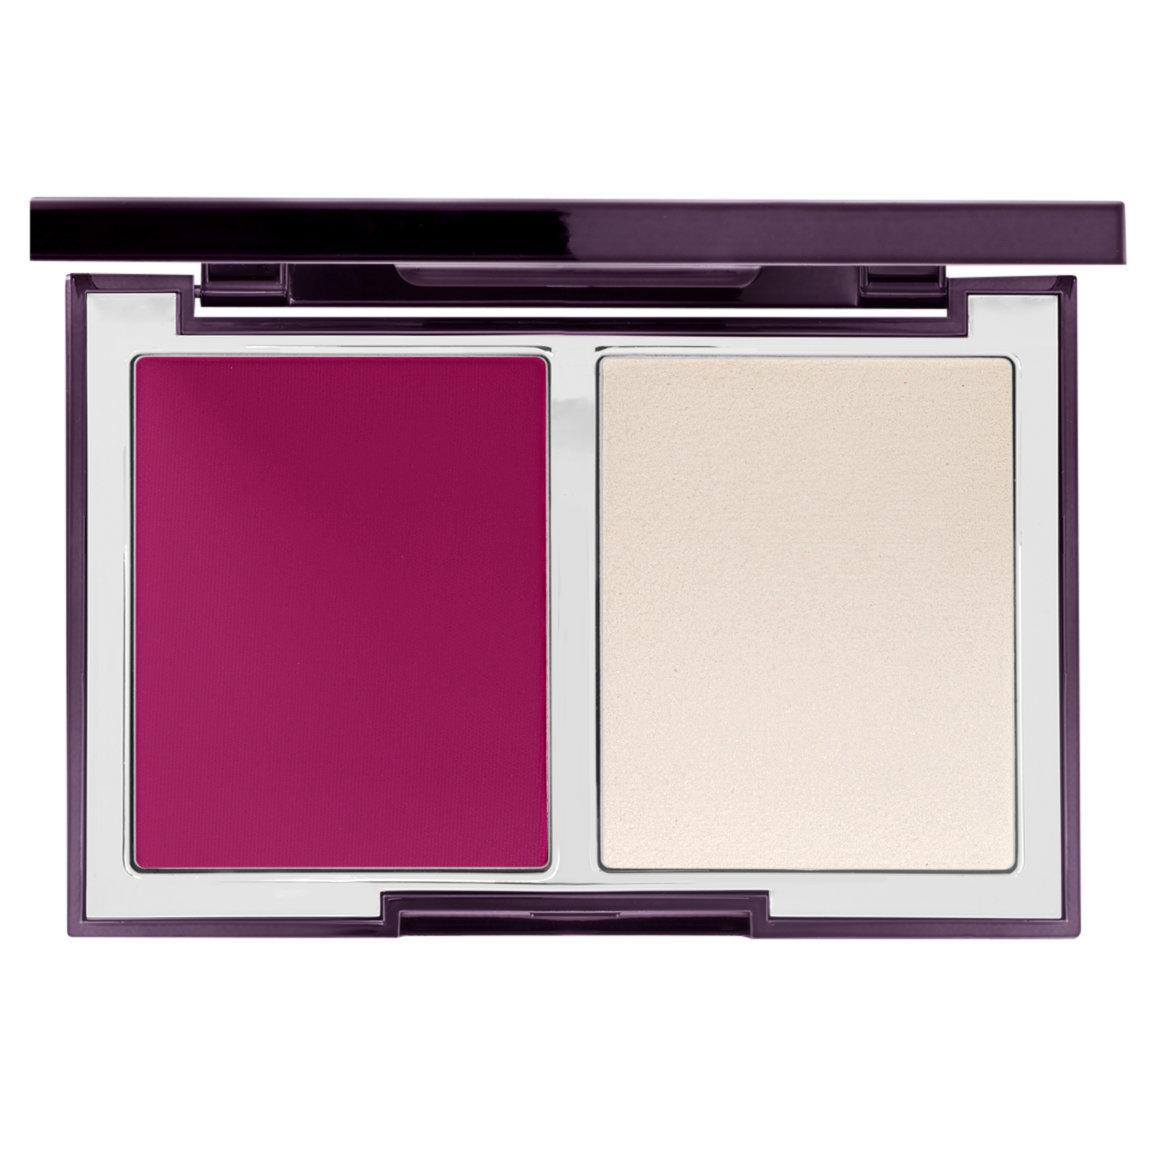 Wayne Goss The Weightless Veil Blush Palette Vivid Azalea alternative view 1 - product swatch.